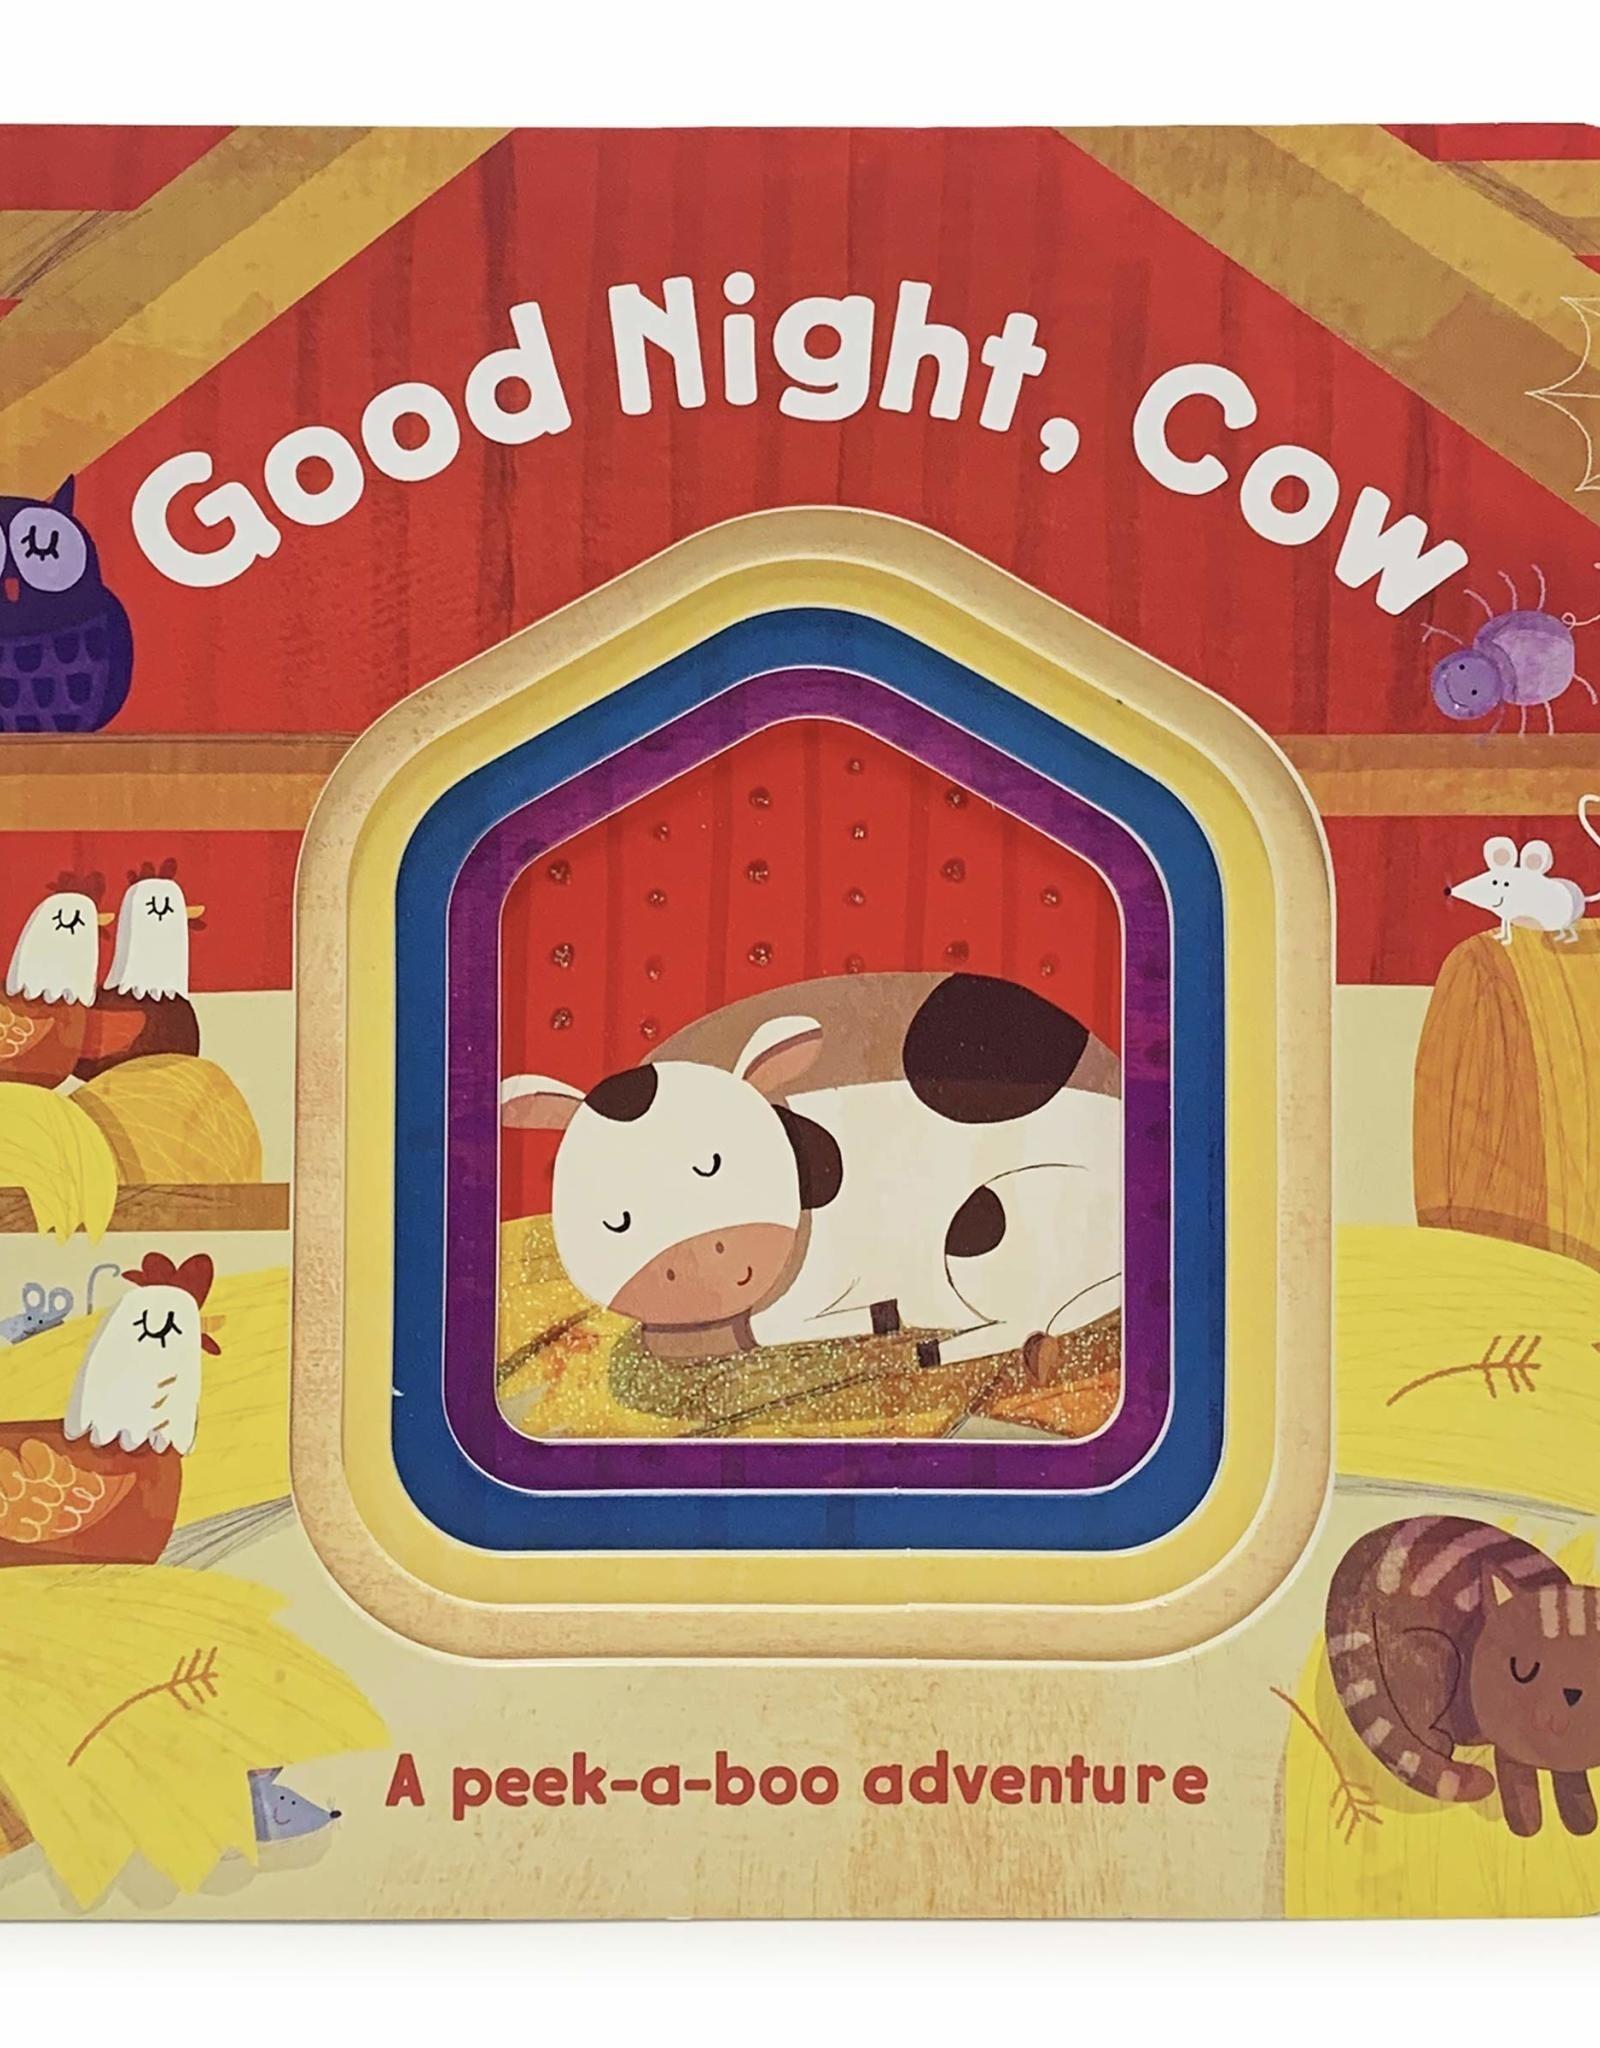 Goodnight, Cow